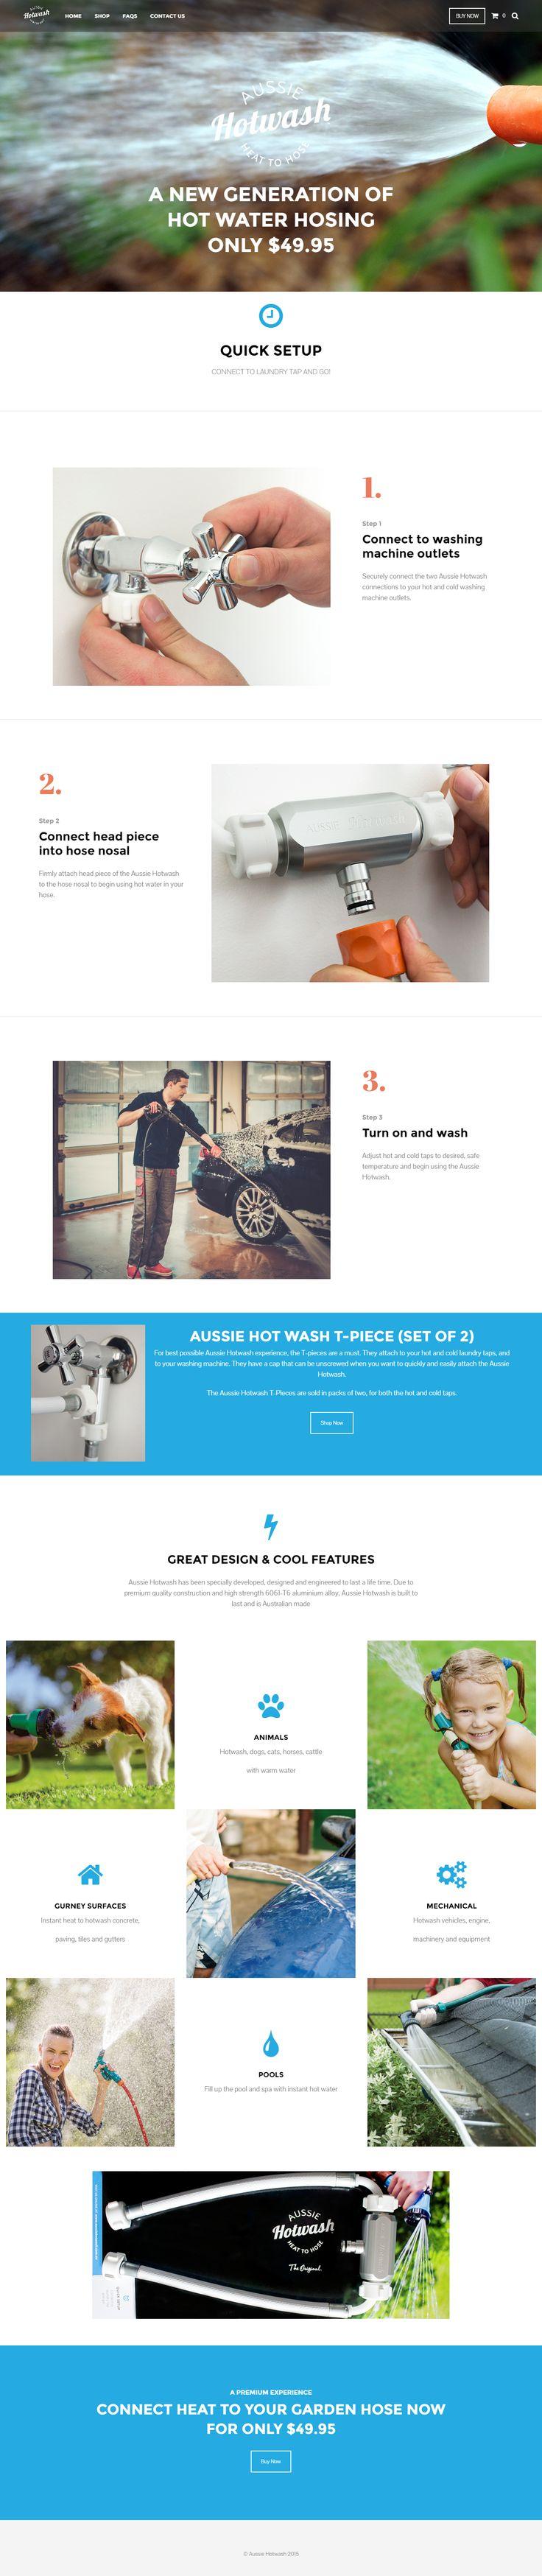 aussiehotwash.com.au/ was built with Shopkeeper eCommerce theme #wordpress #bestsites #webdesign #ecommerce #showcase #parallax http://themeforest.net/item/shopkeeper-responsive-wordpress-theme/9553045?&utm_source=pinterest.com&utm_medium=social&utm_content=aussie-hotwash&utm_campaign=showcase